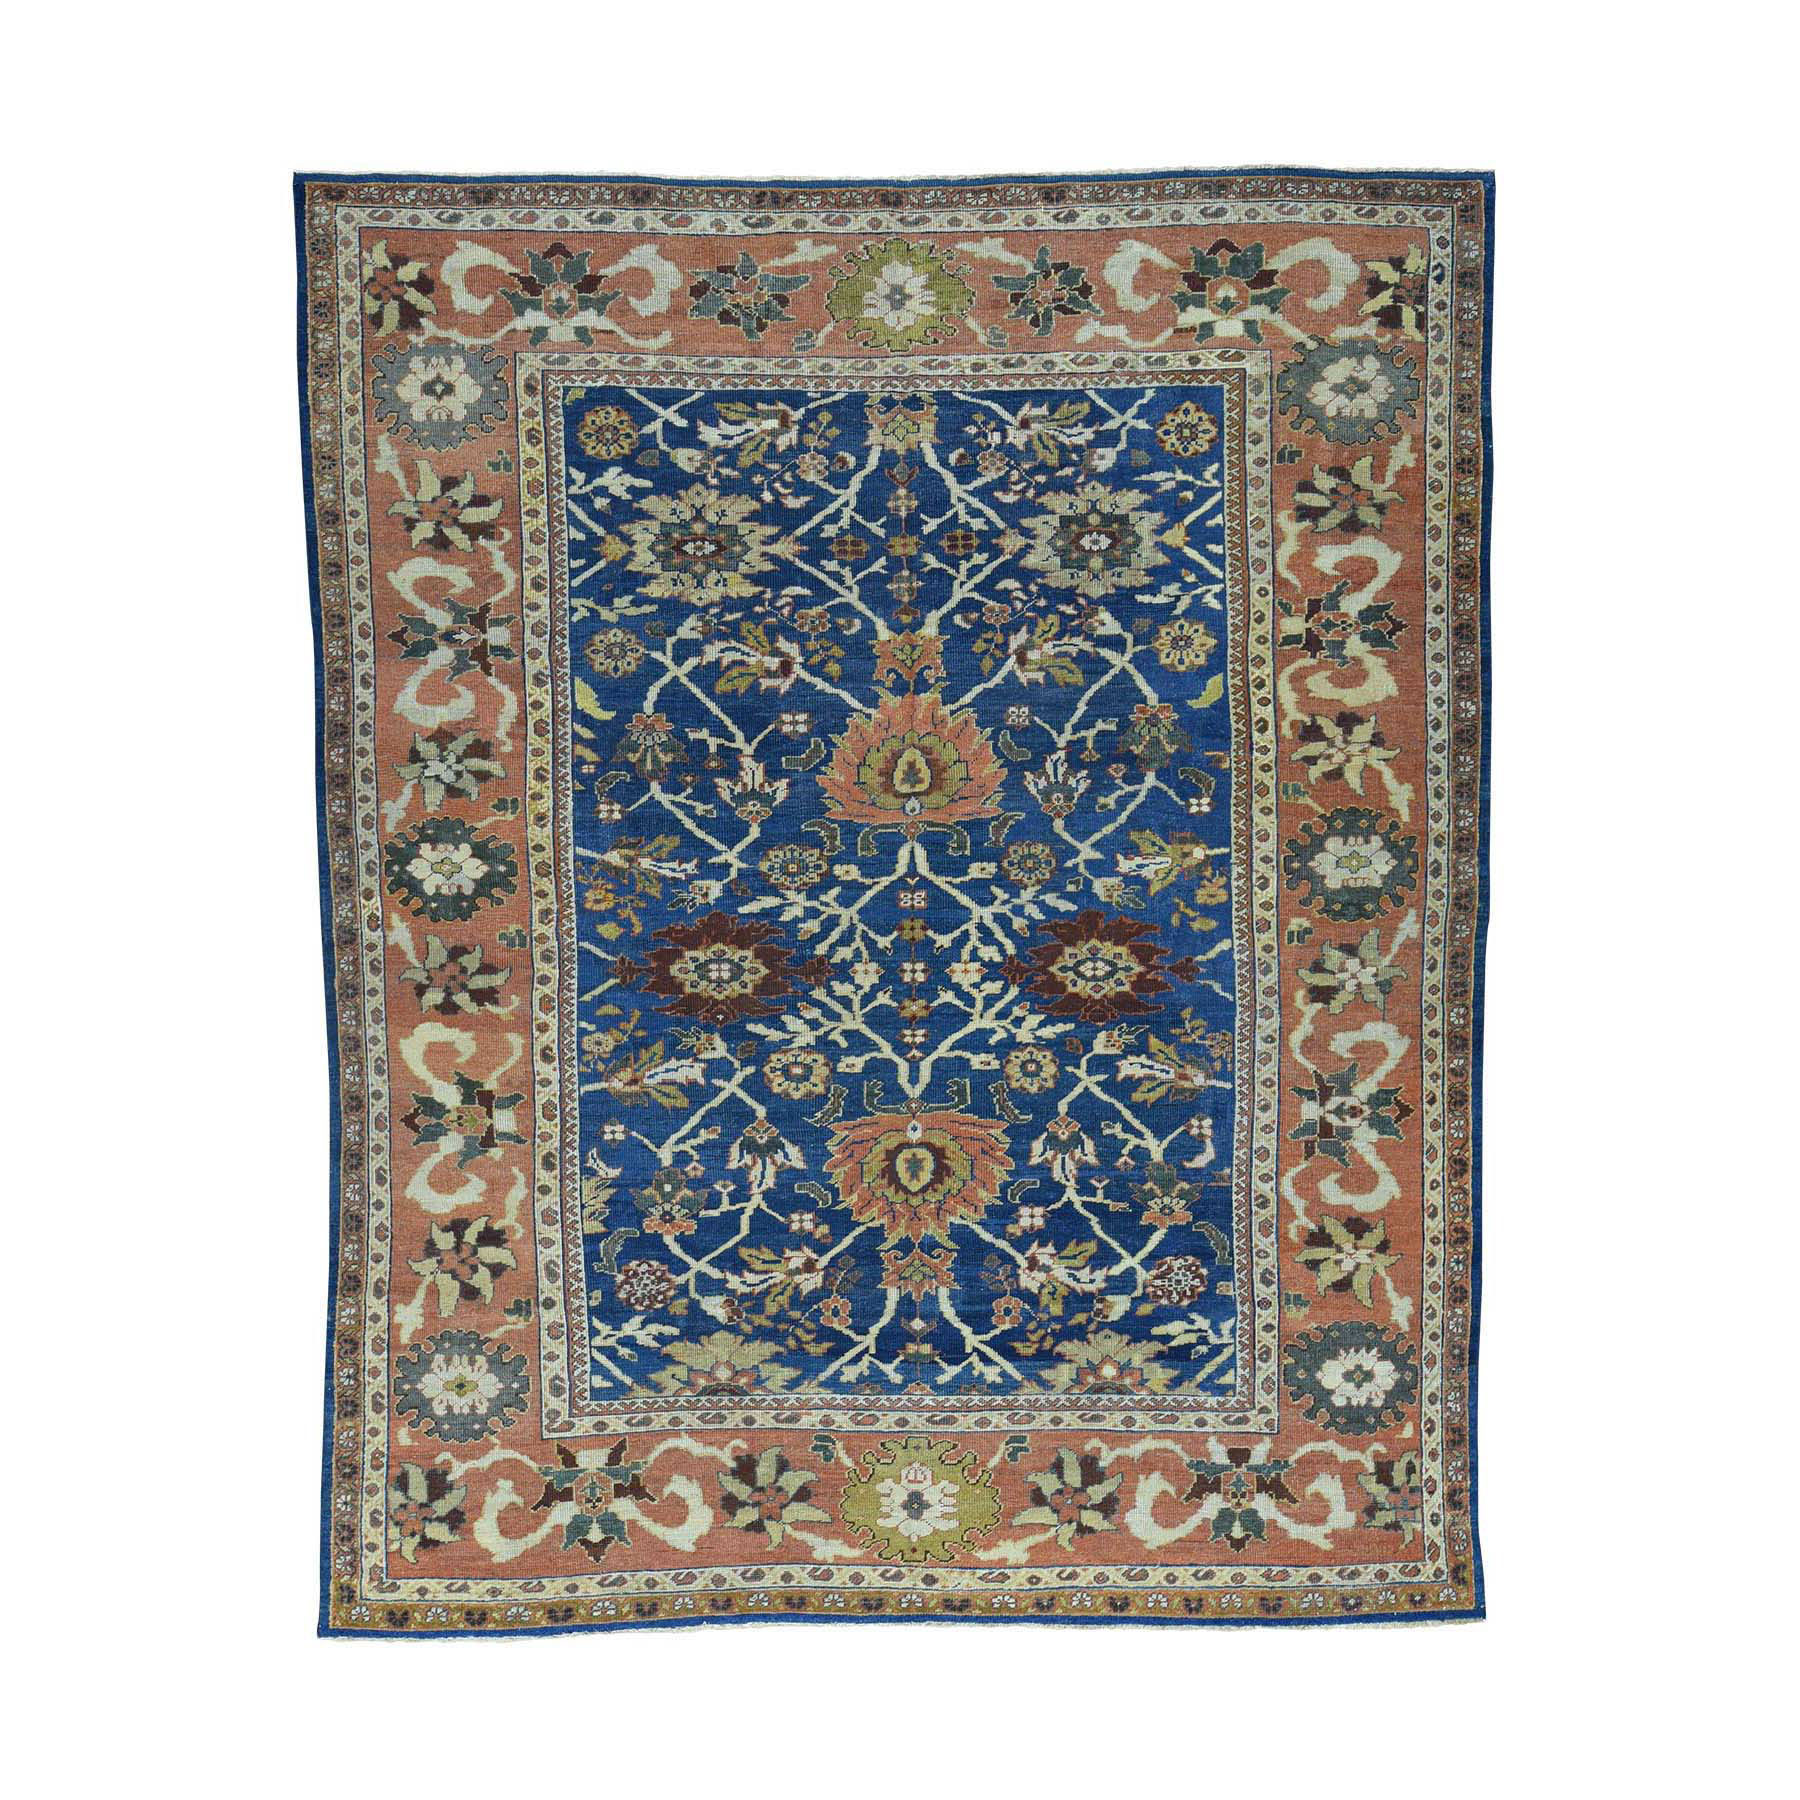 "8'1""X10'1"" Antique Persian Mahal Navy Blue Even Wear Handmade Rug moacd788"